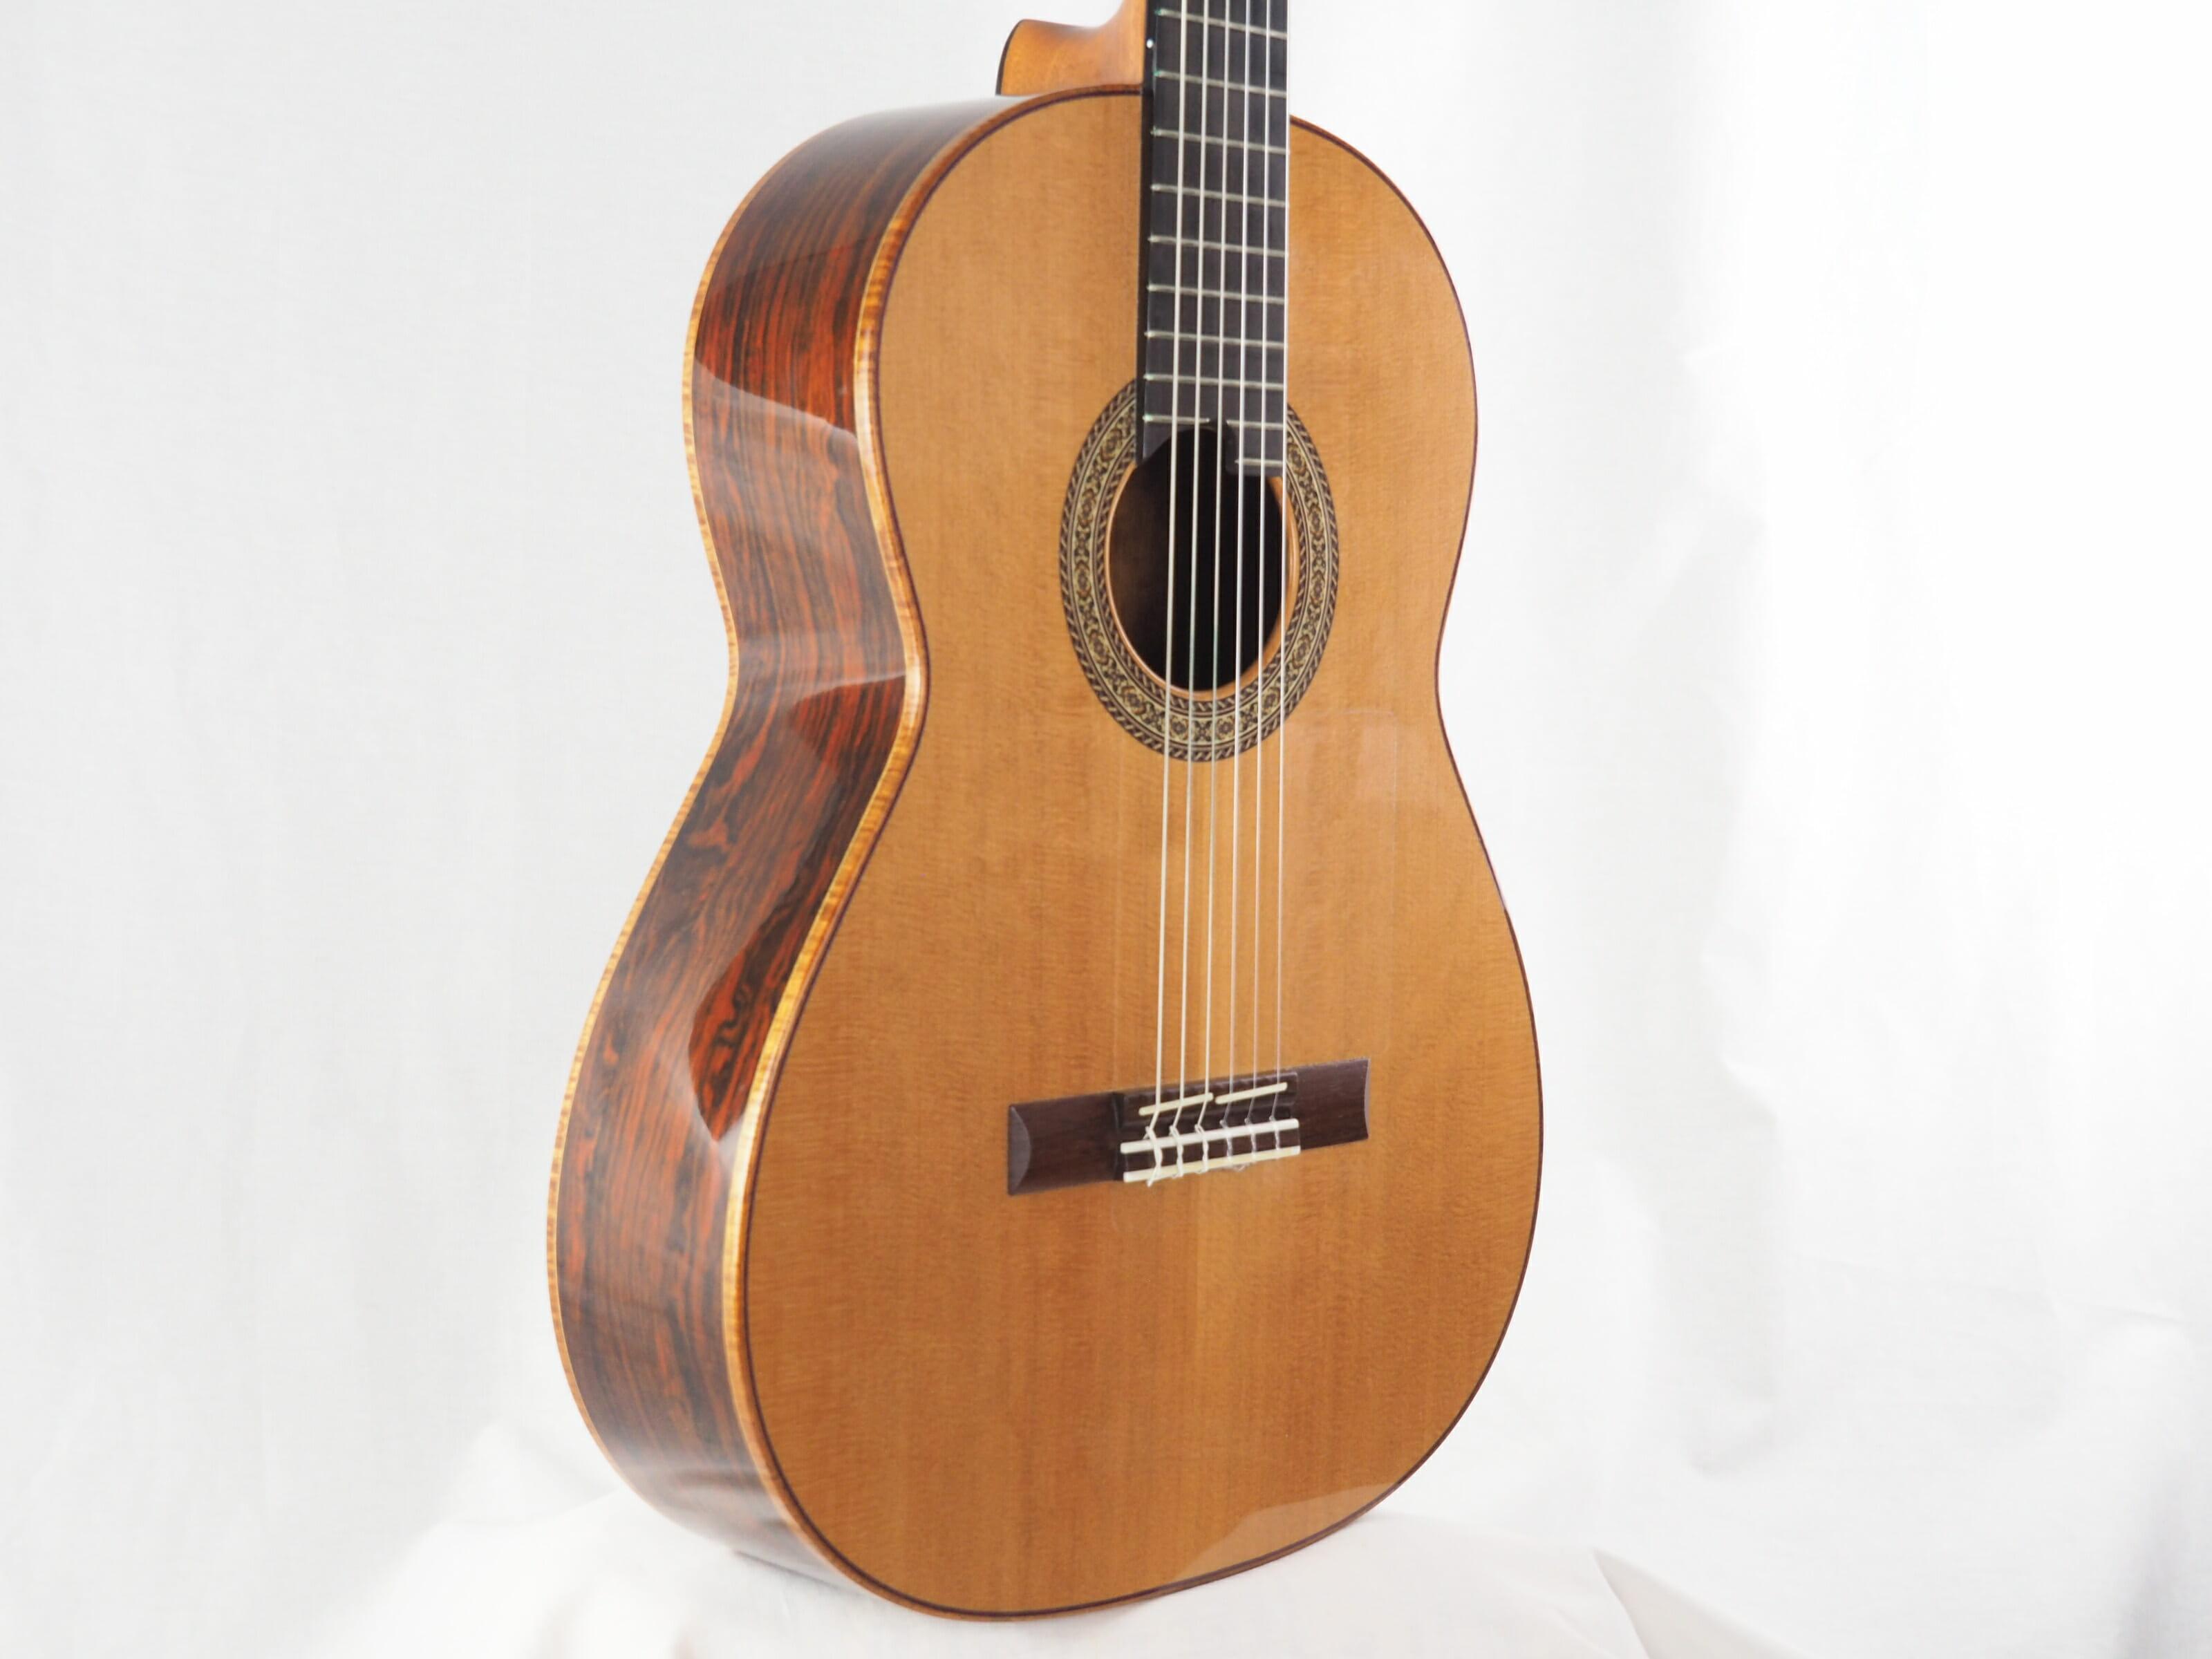 John Price luthier guitare classique No 19PRI348-07